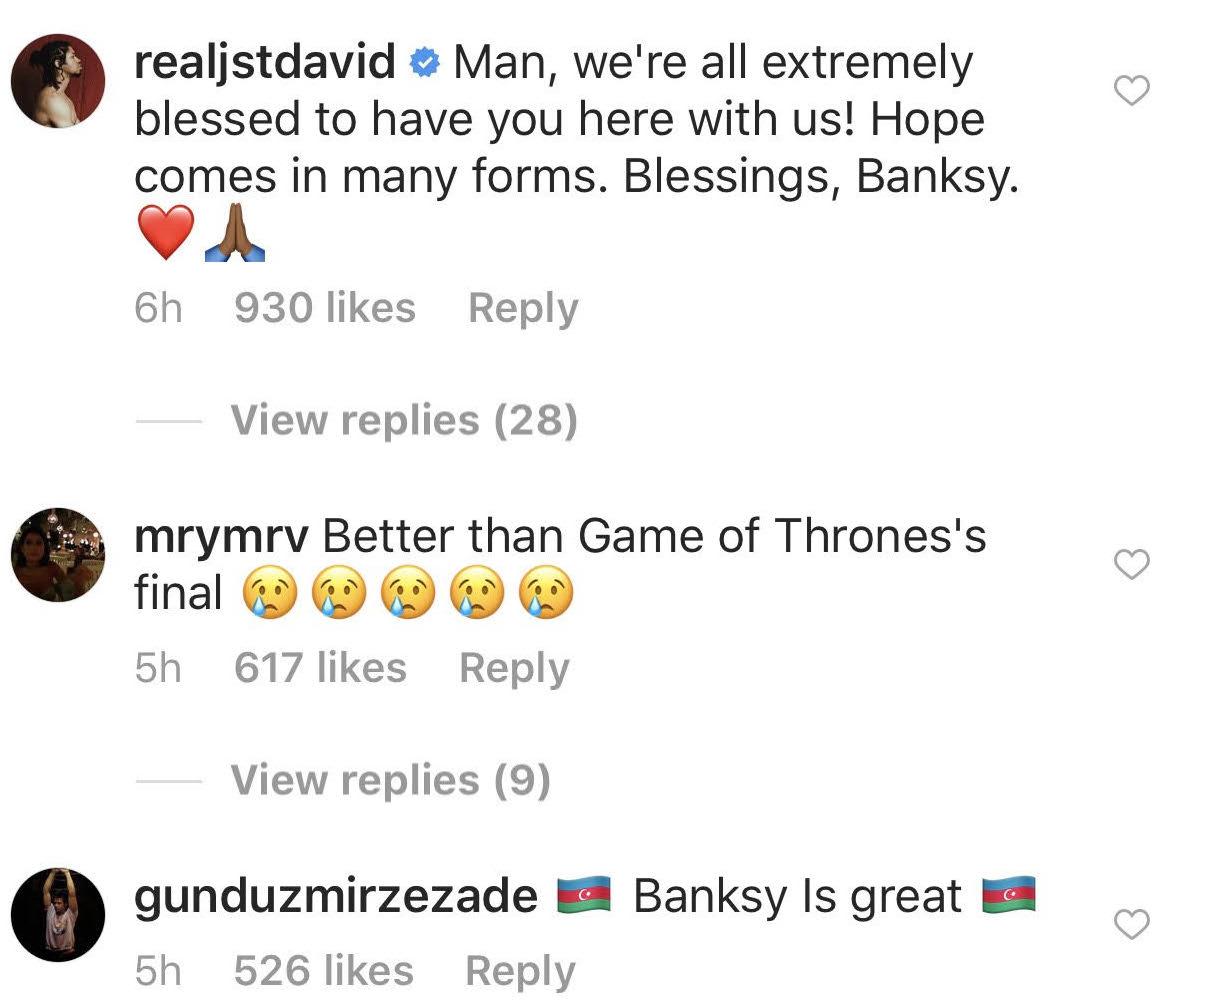 Bansky komentari citalaca